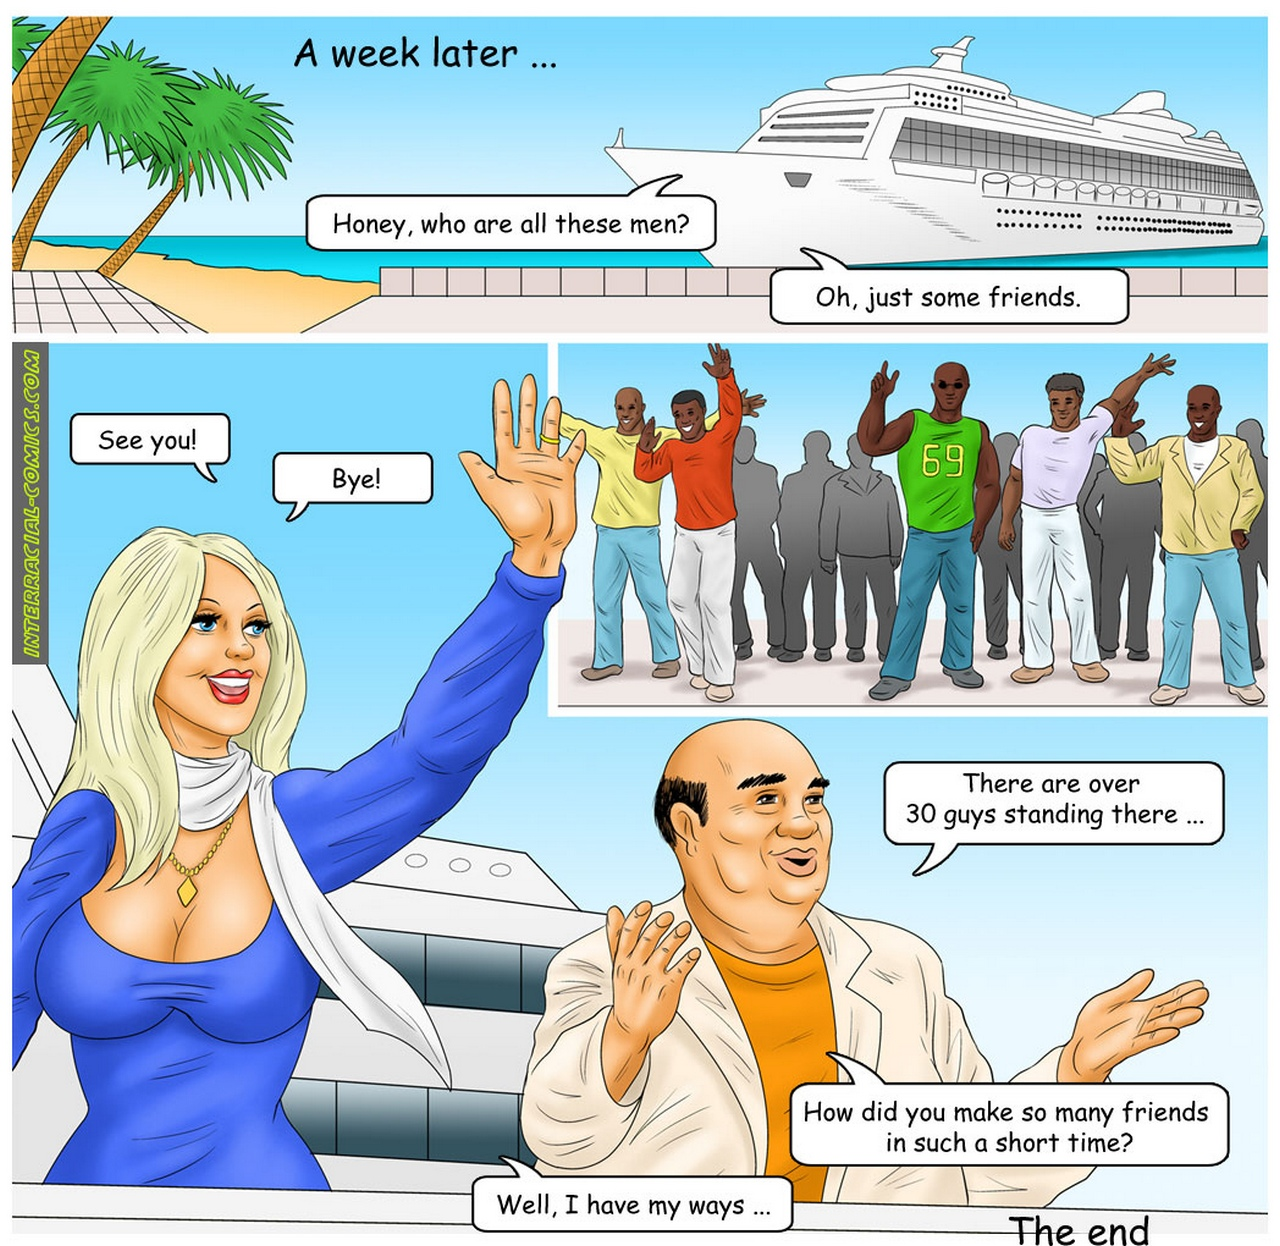 The Caribbean Holidays - part 3